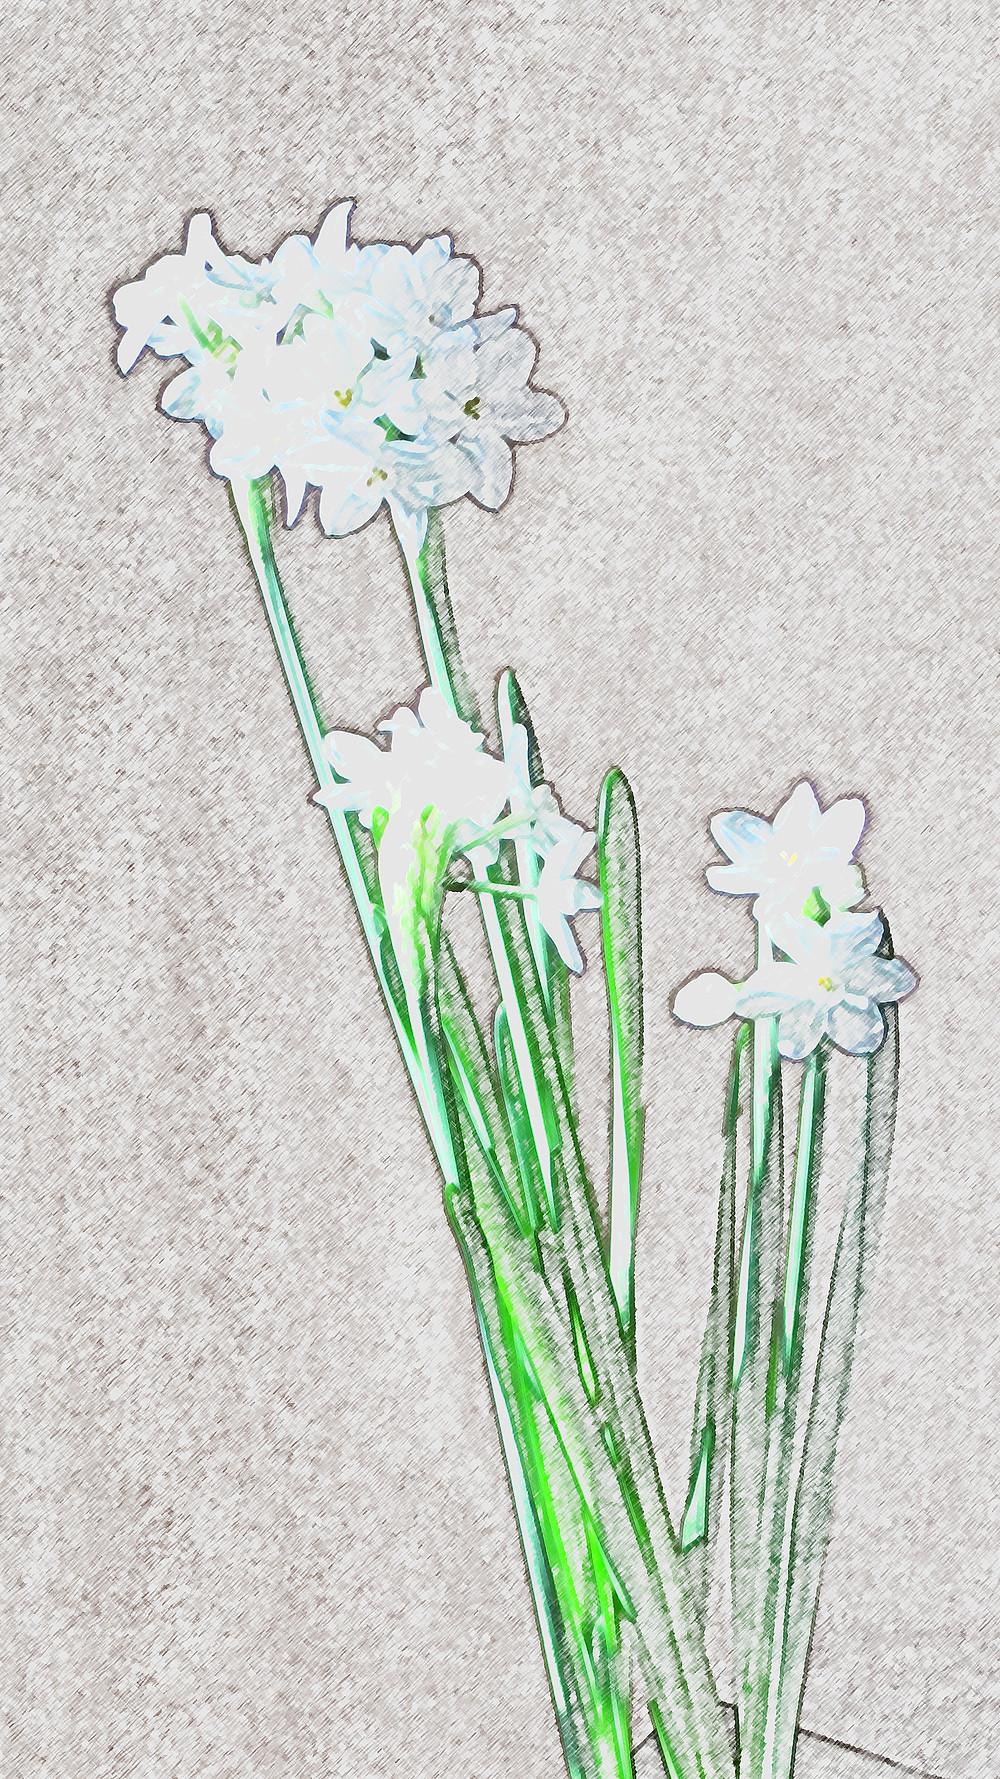 Pencil Sketch of Flowers